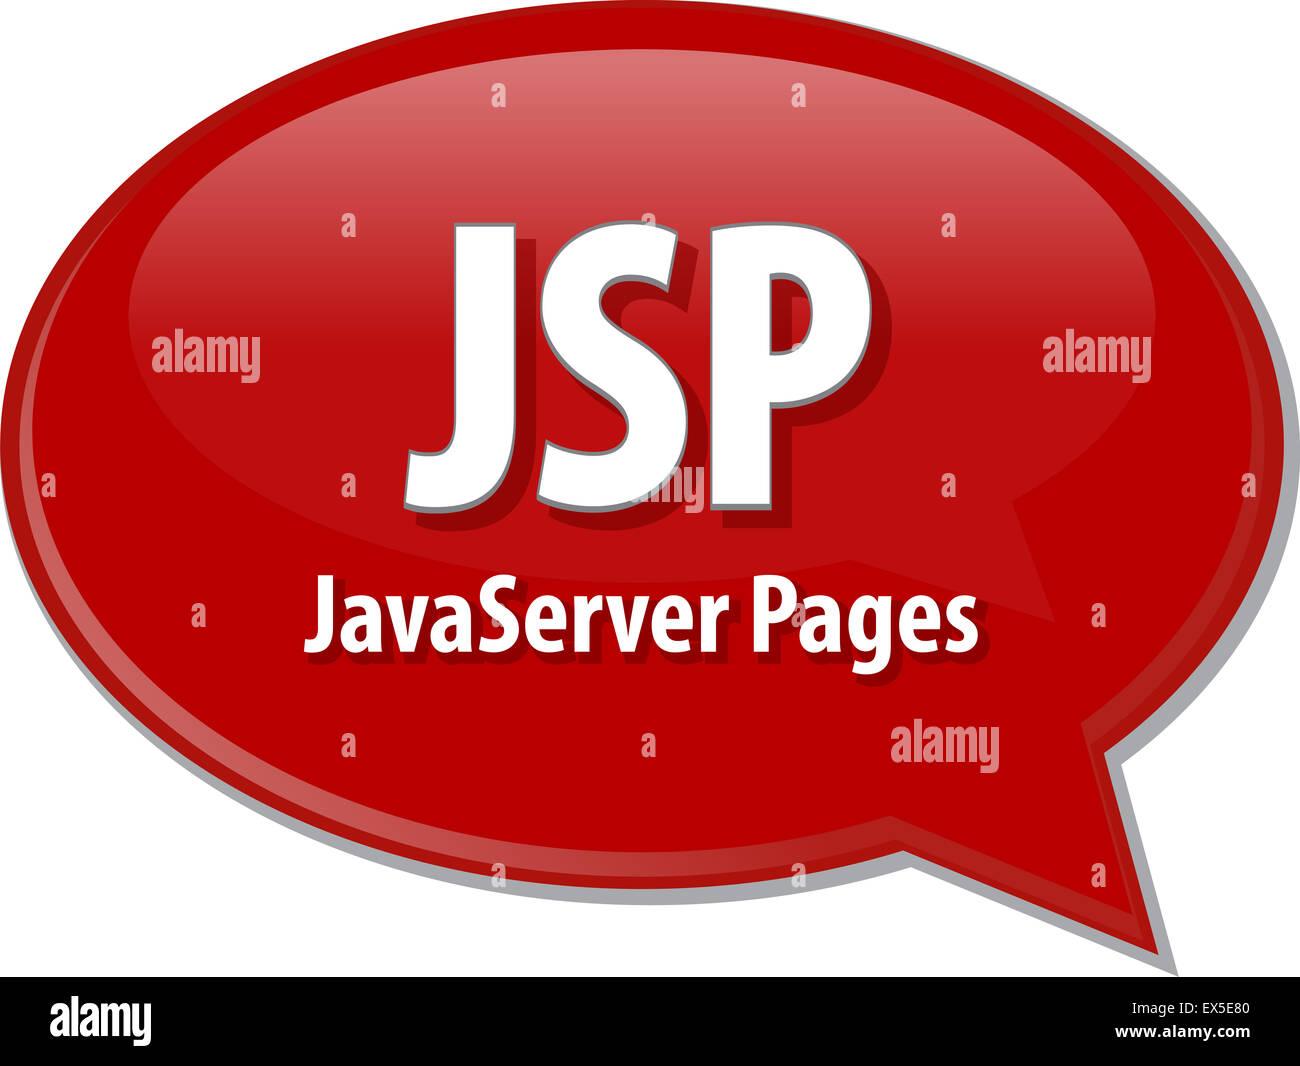 Speech bubble illustration of information technology acronym abbreviation term definition JSP Java Server Pages - Stock Image